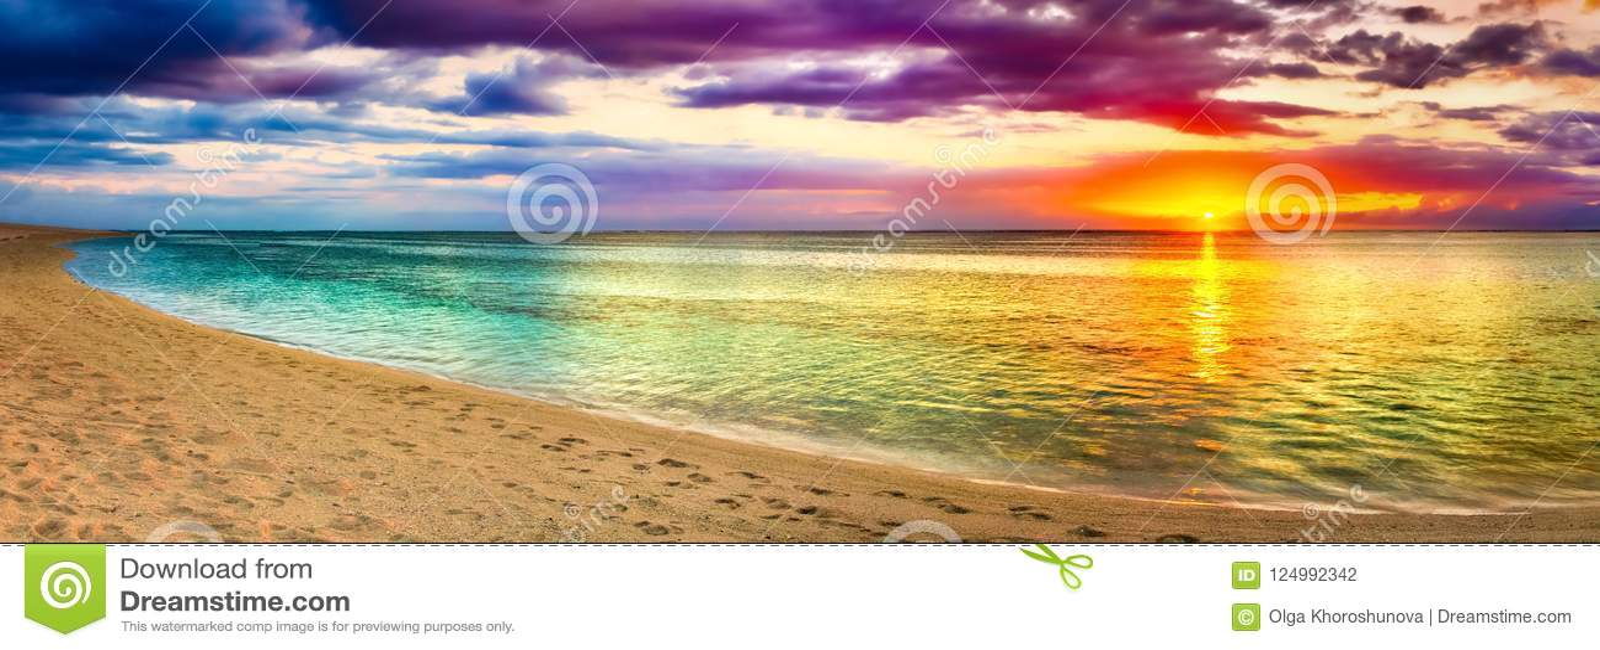 Вид на море на заходе солнца изумительный ландшафт панорама пляжа красивейшая